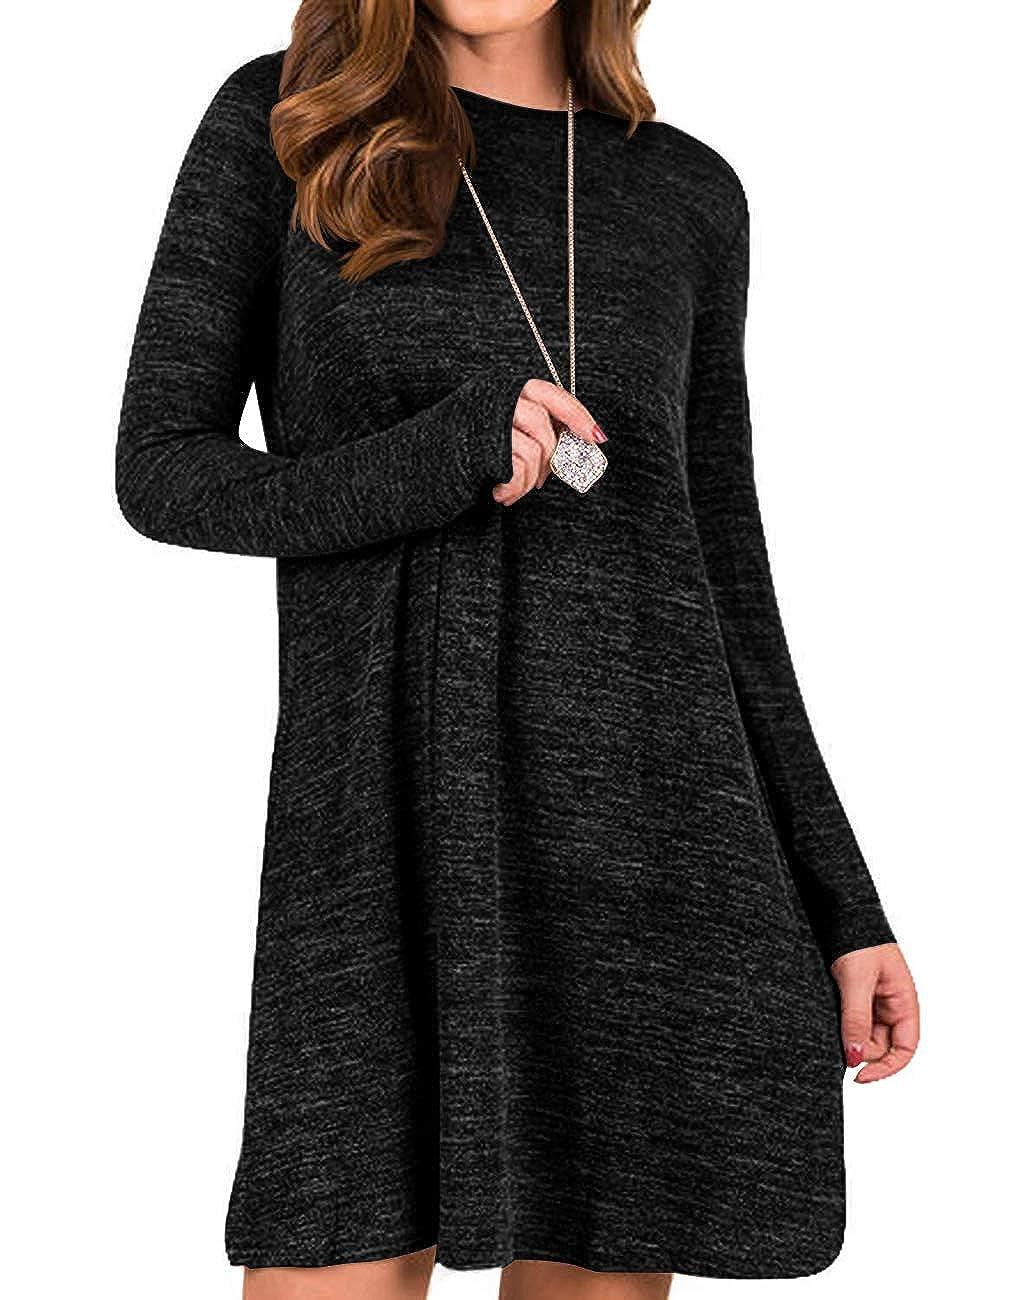 Sanifer Womens Knit Long Sleeve T Shirt Dress Sweater Dress Tunic